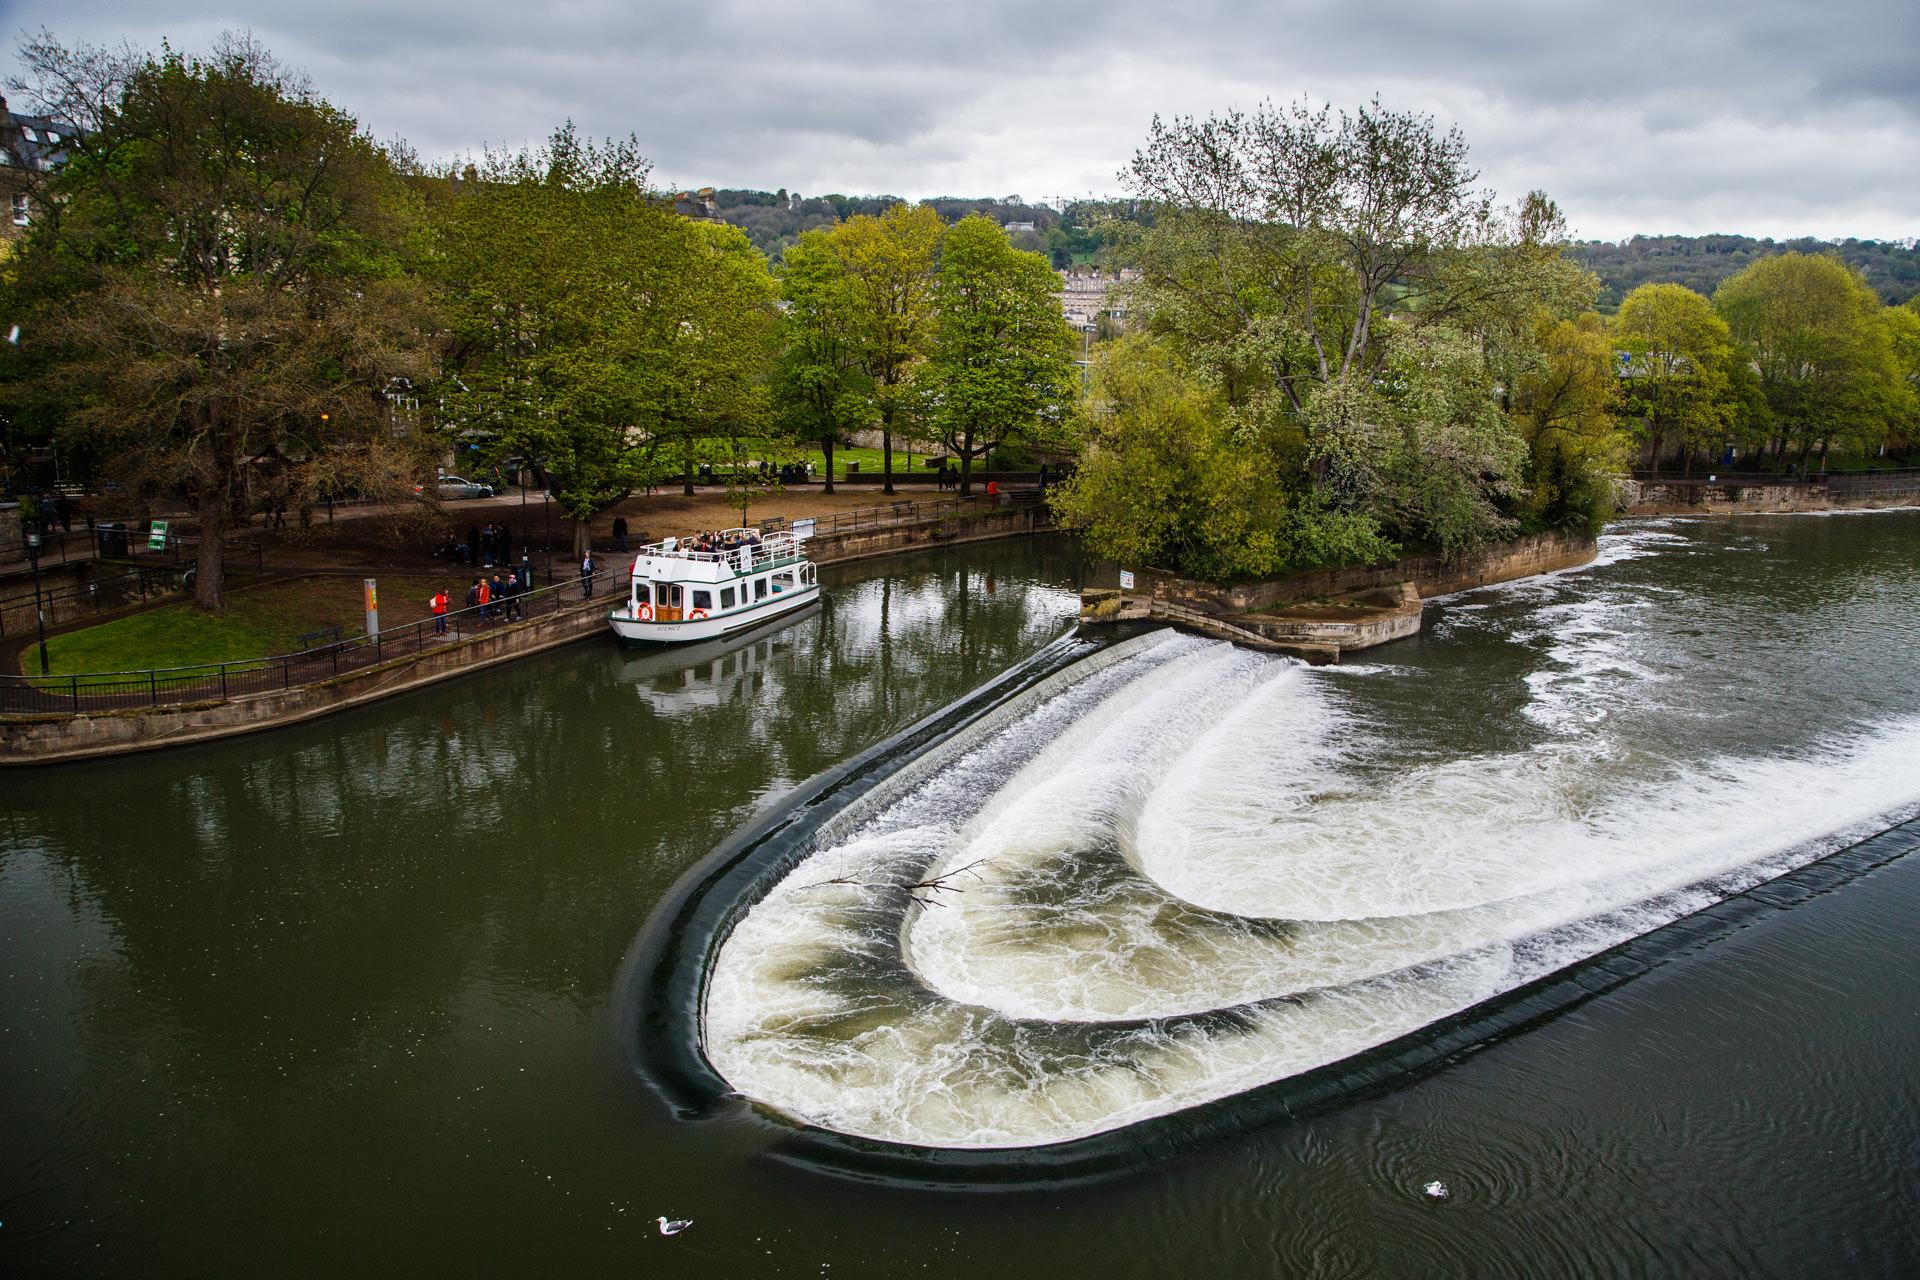 …and Pulteney Weir.